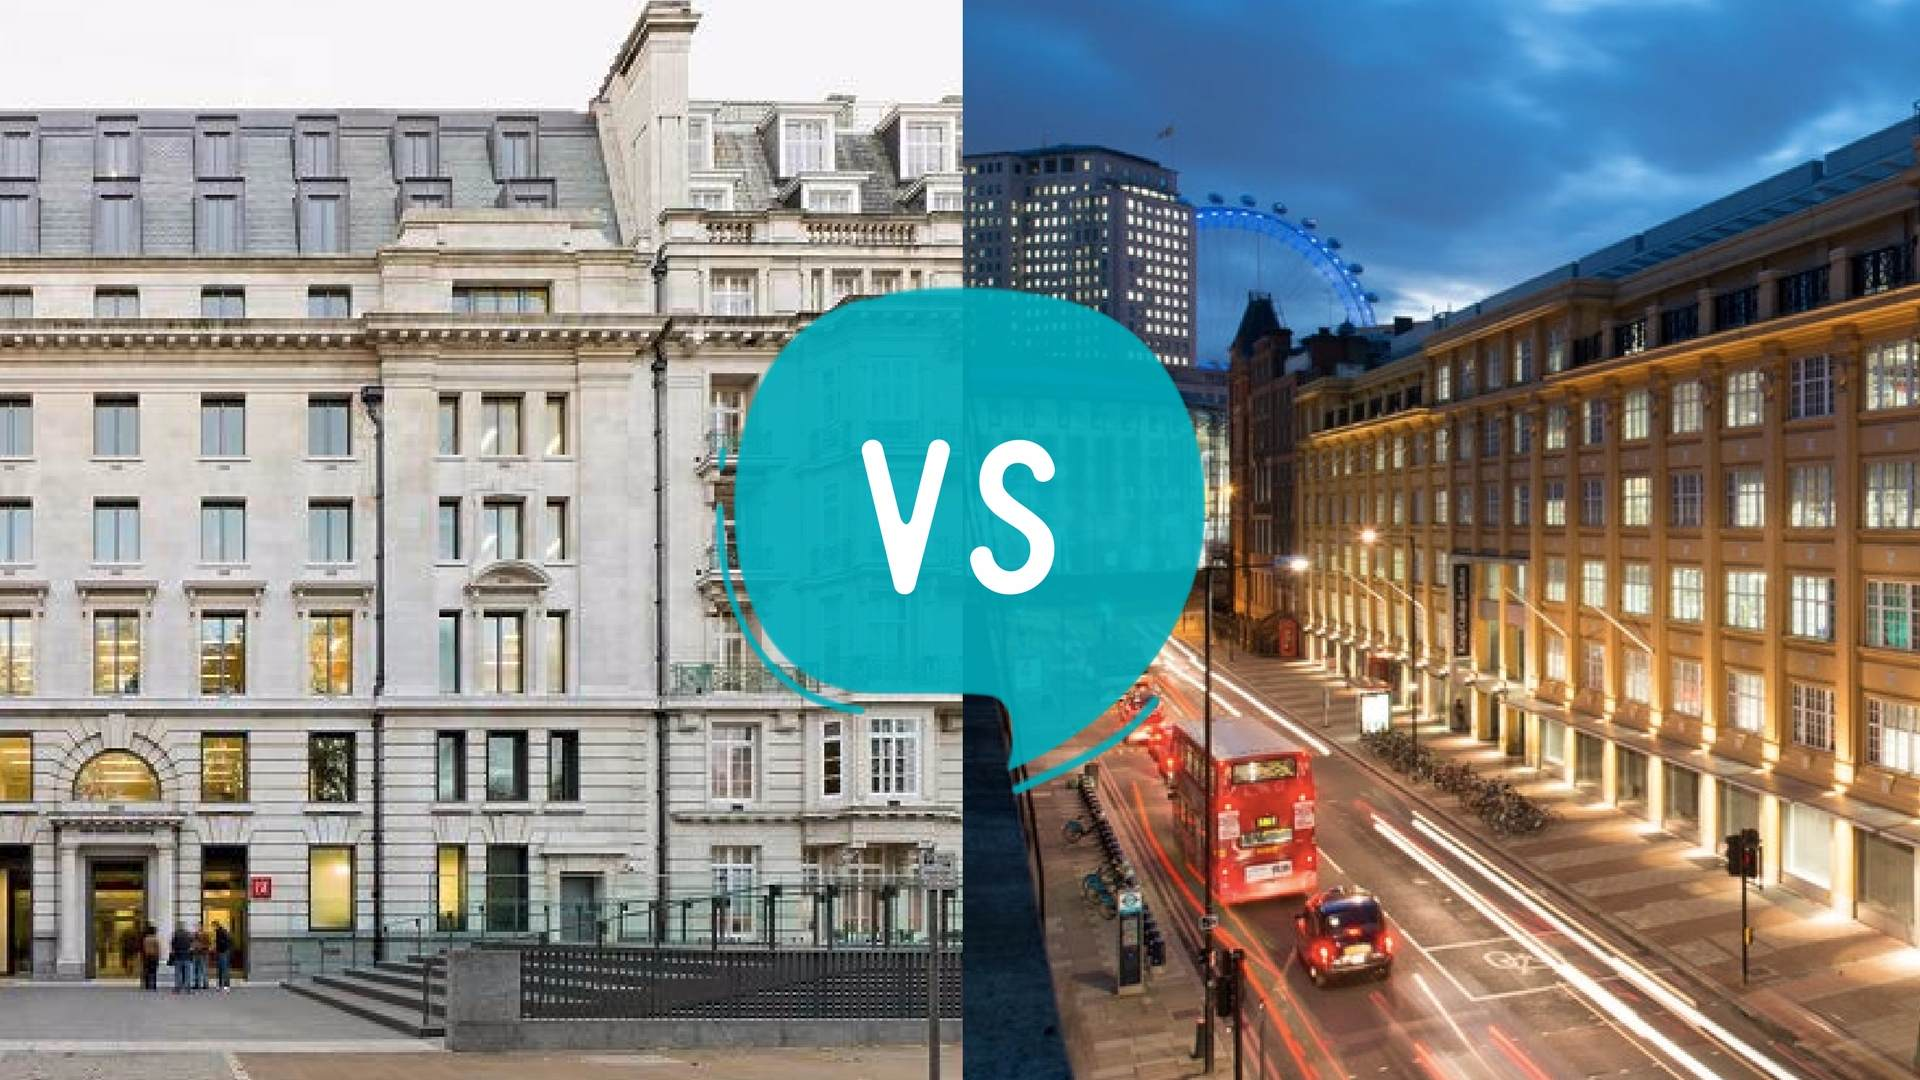 London School of Economics (LSE) Vs King's College London ...